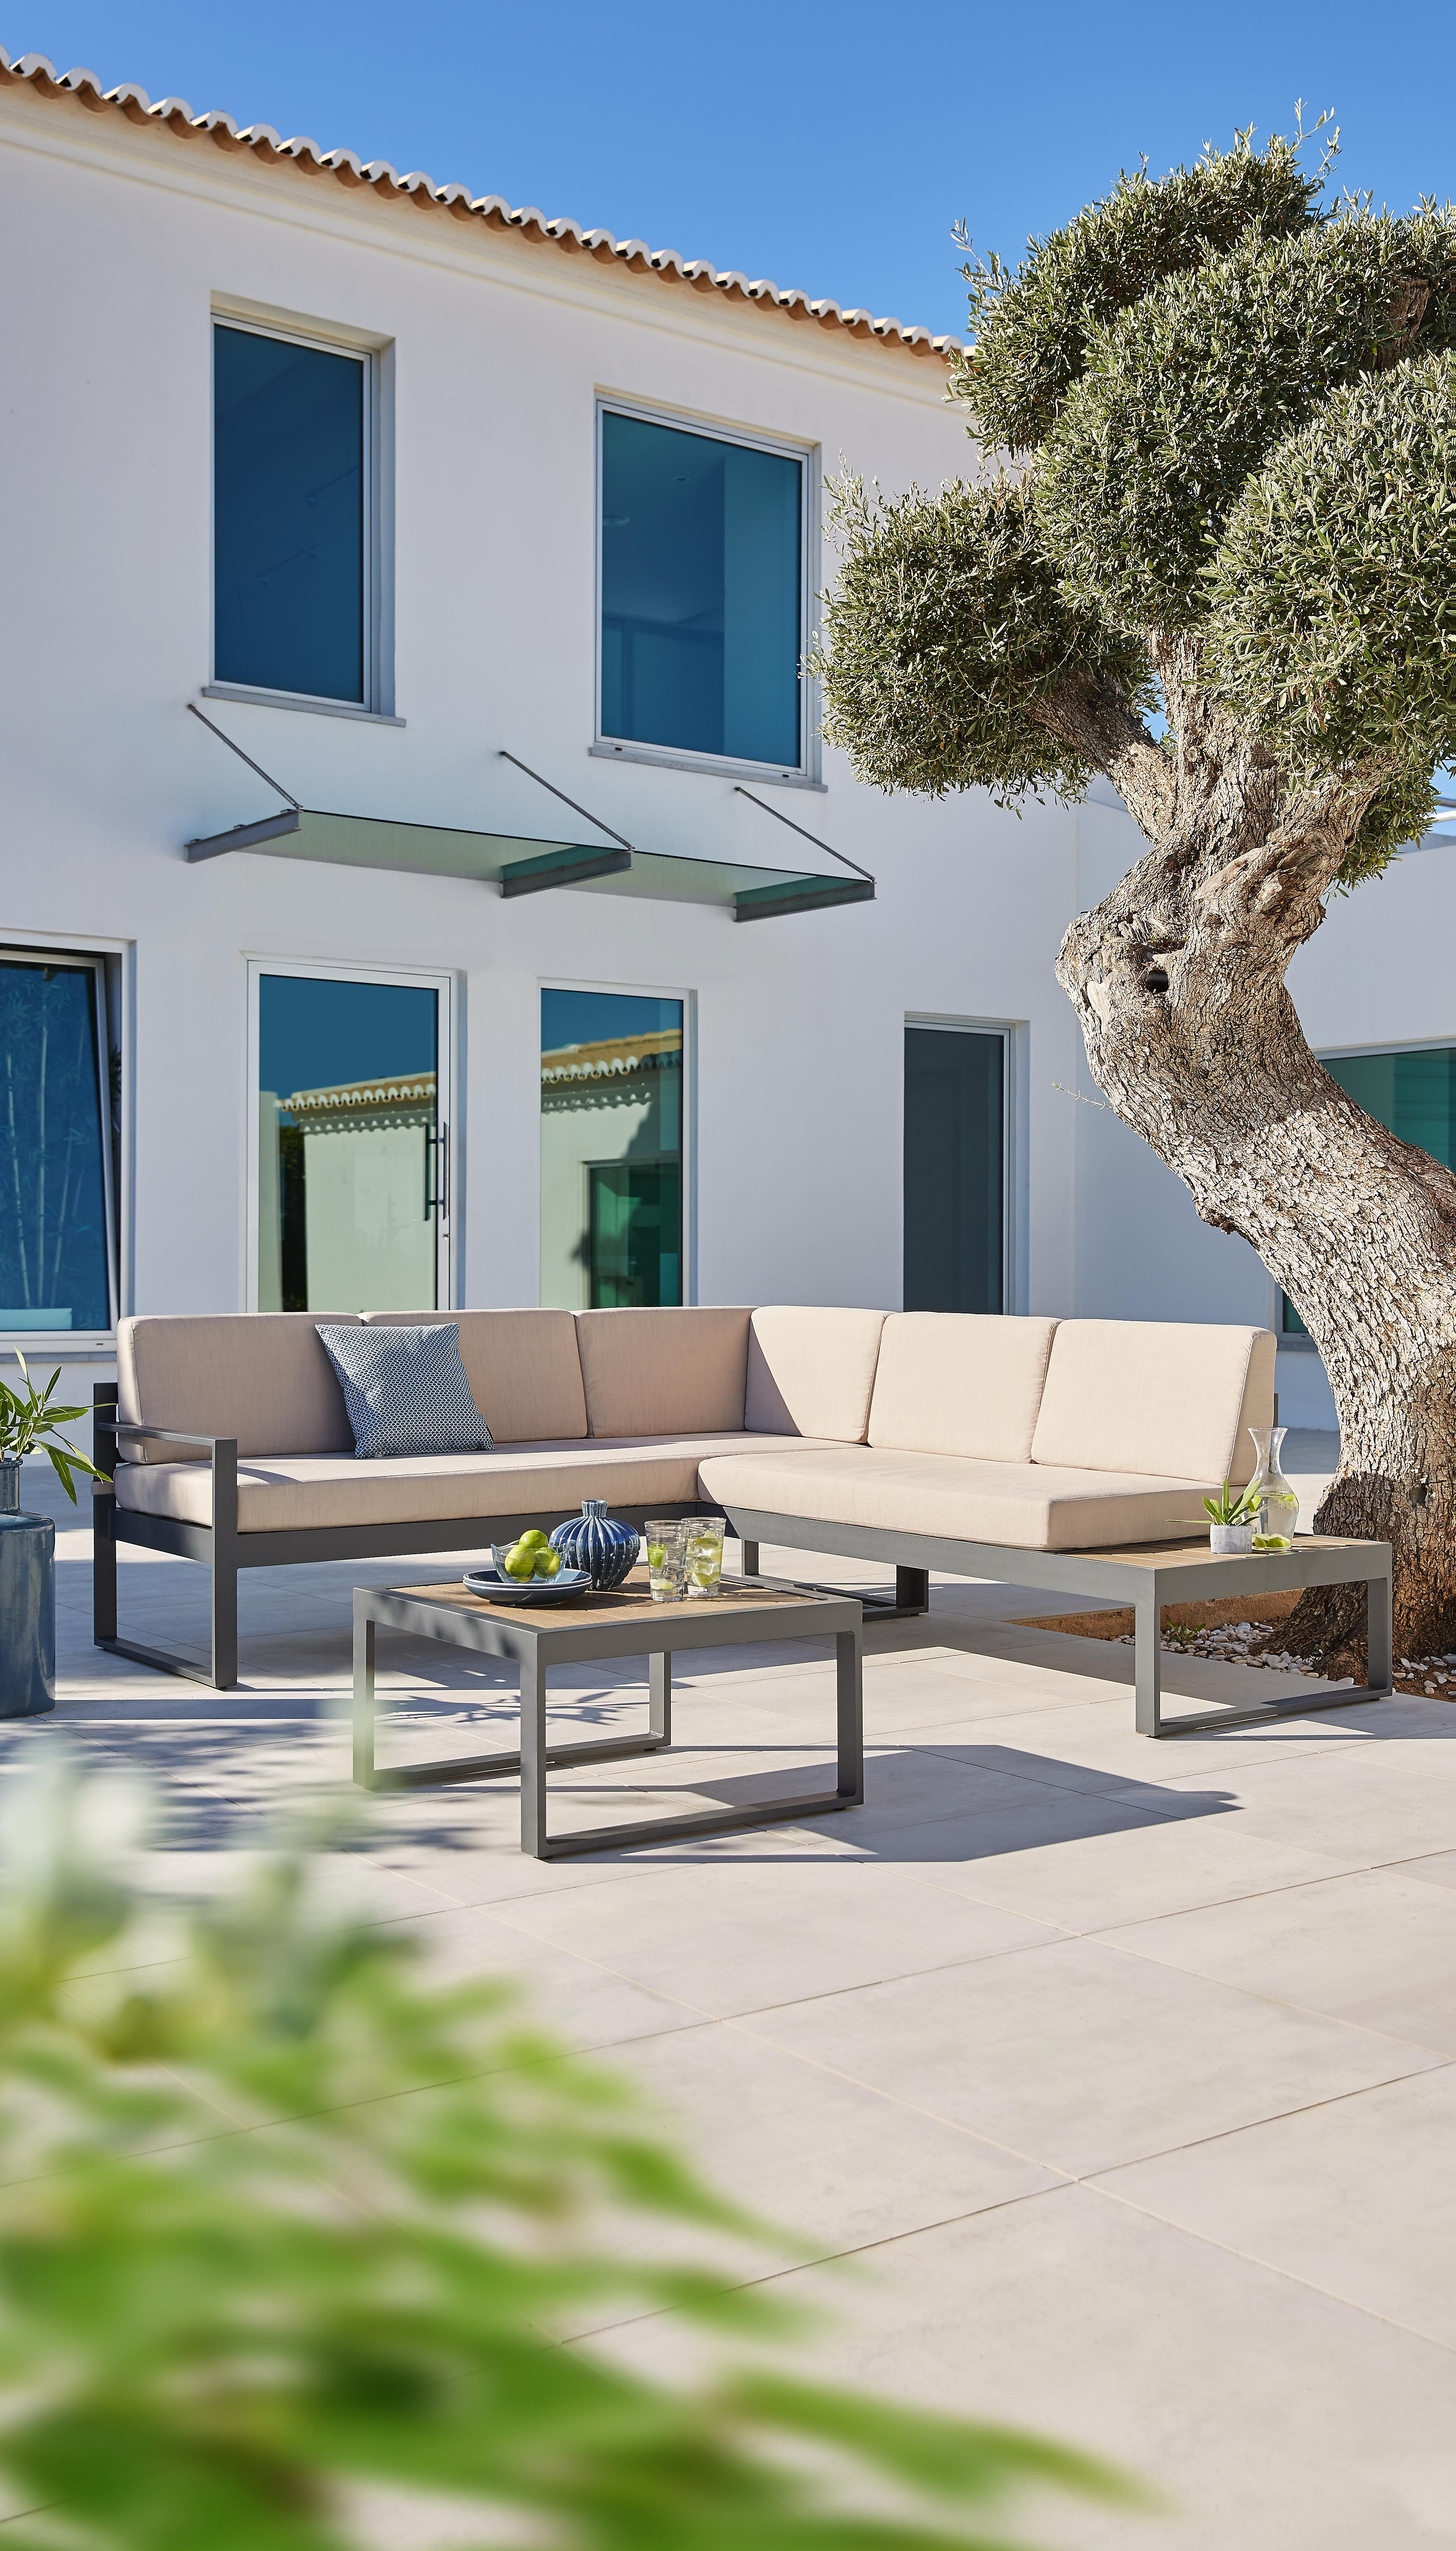 Lounge Garnitur Fur Den Garten Aus Metall Lounge Garnitur Lounge Lounge Mobel